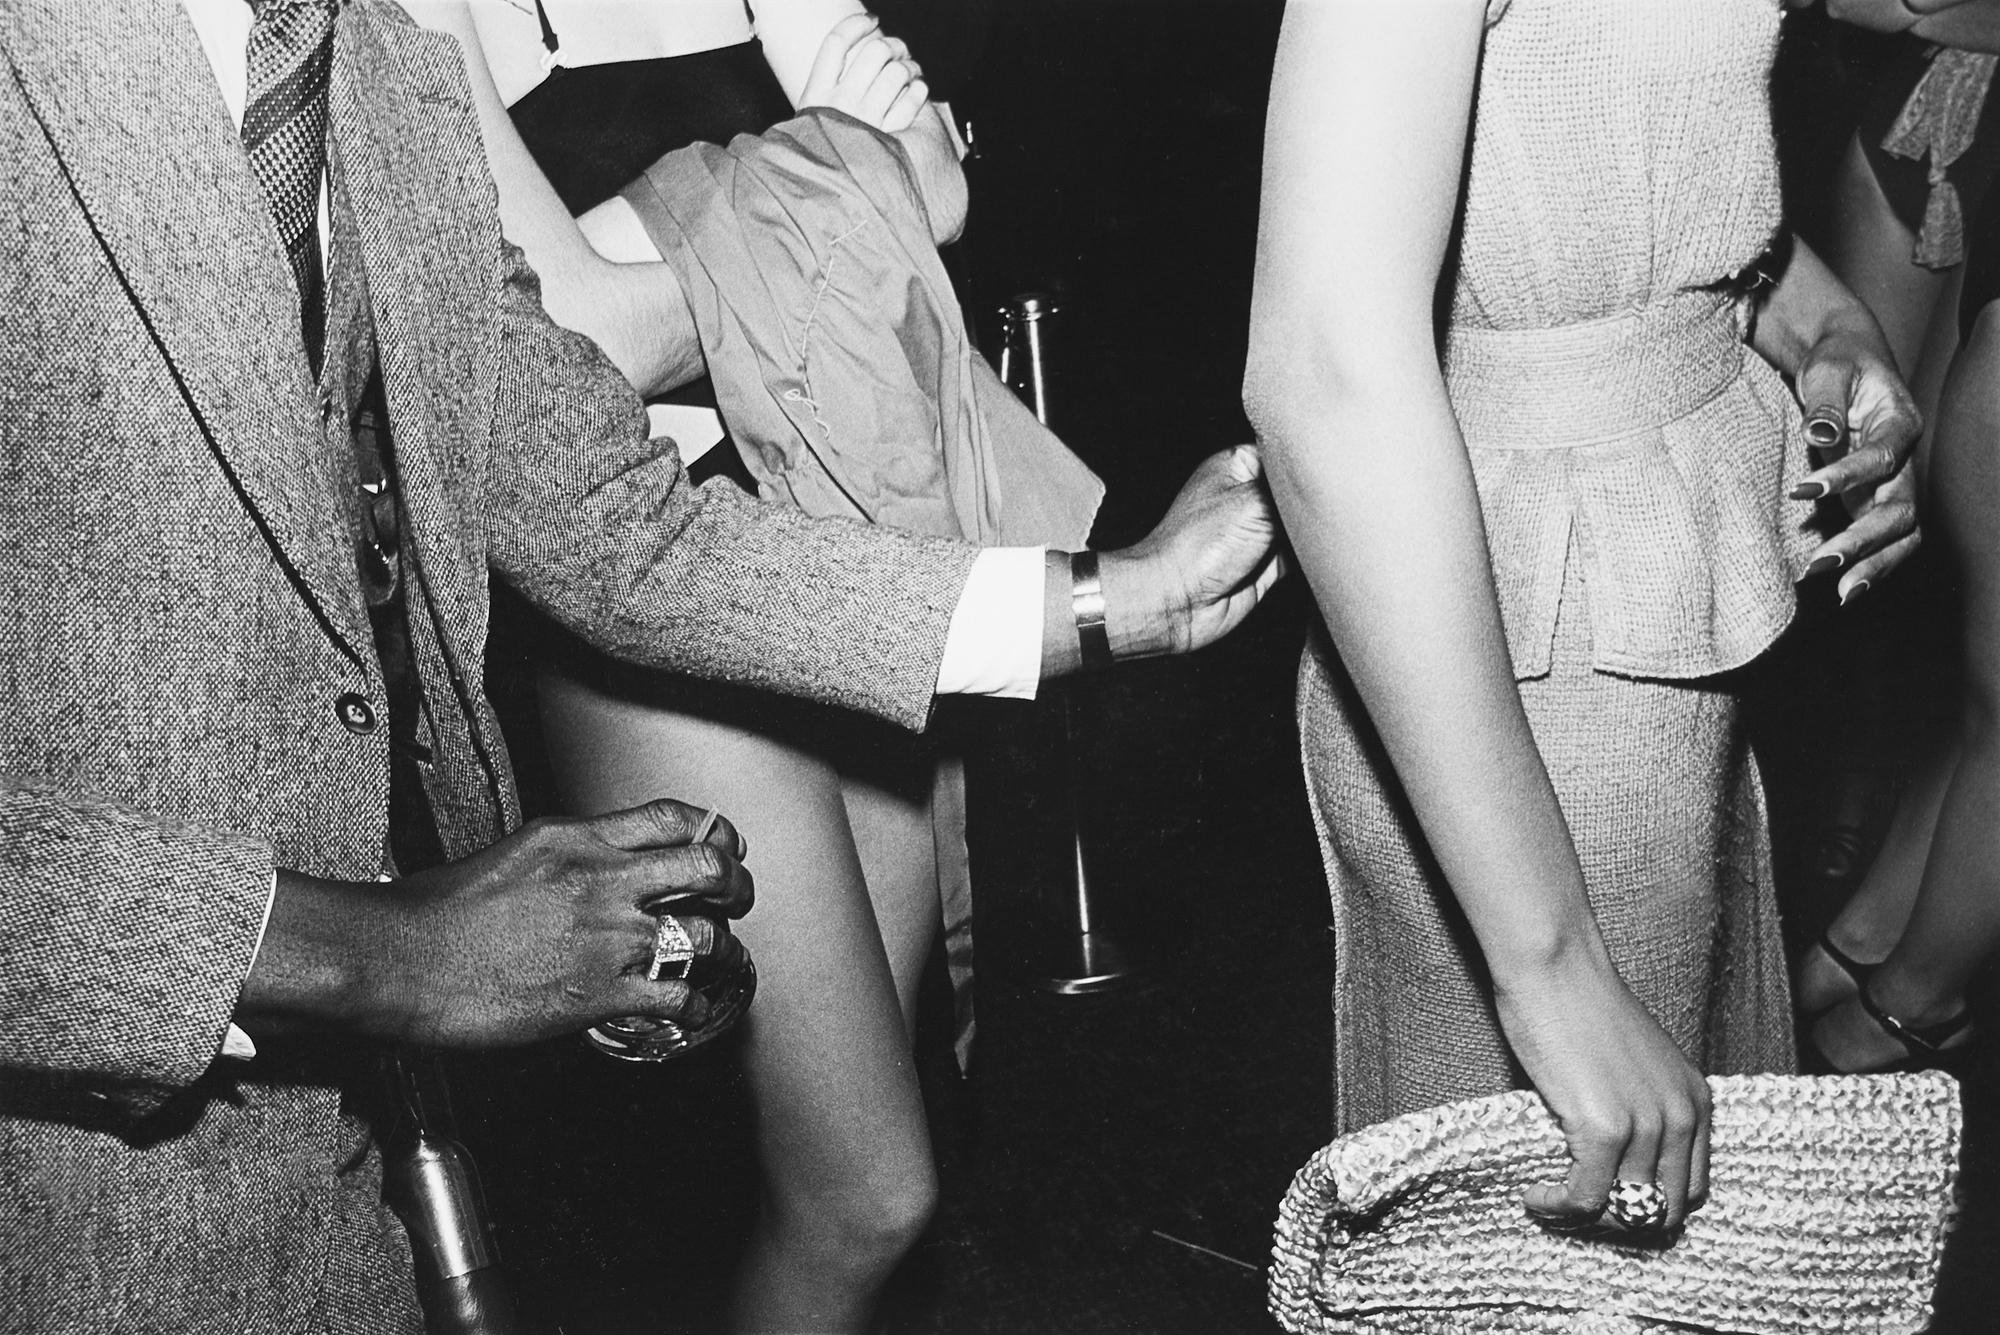 Tony_Ward_photography_early_work_Night_Fever_portfolio_1970's_fashion_style